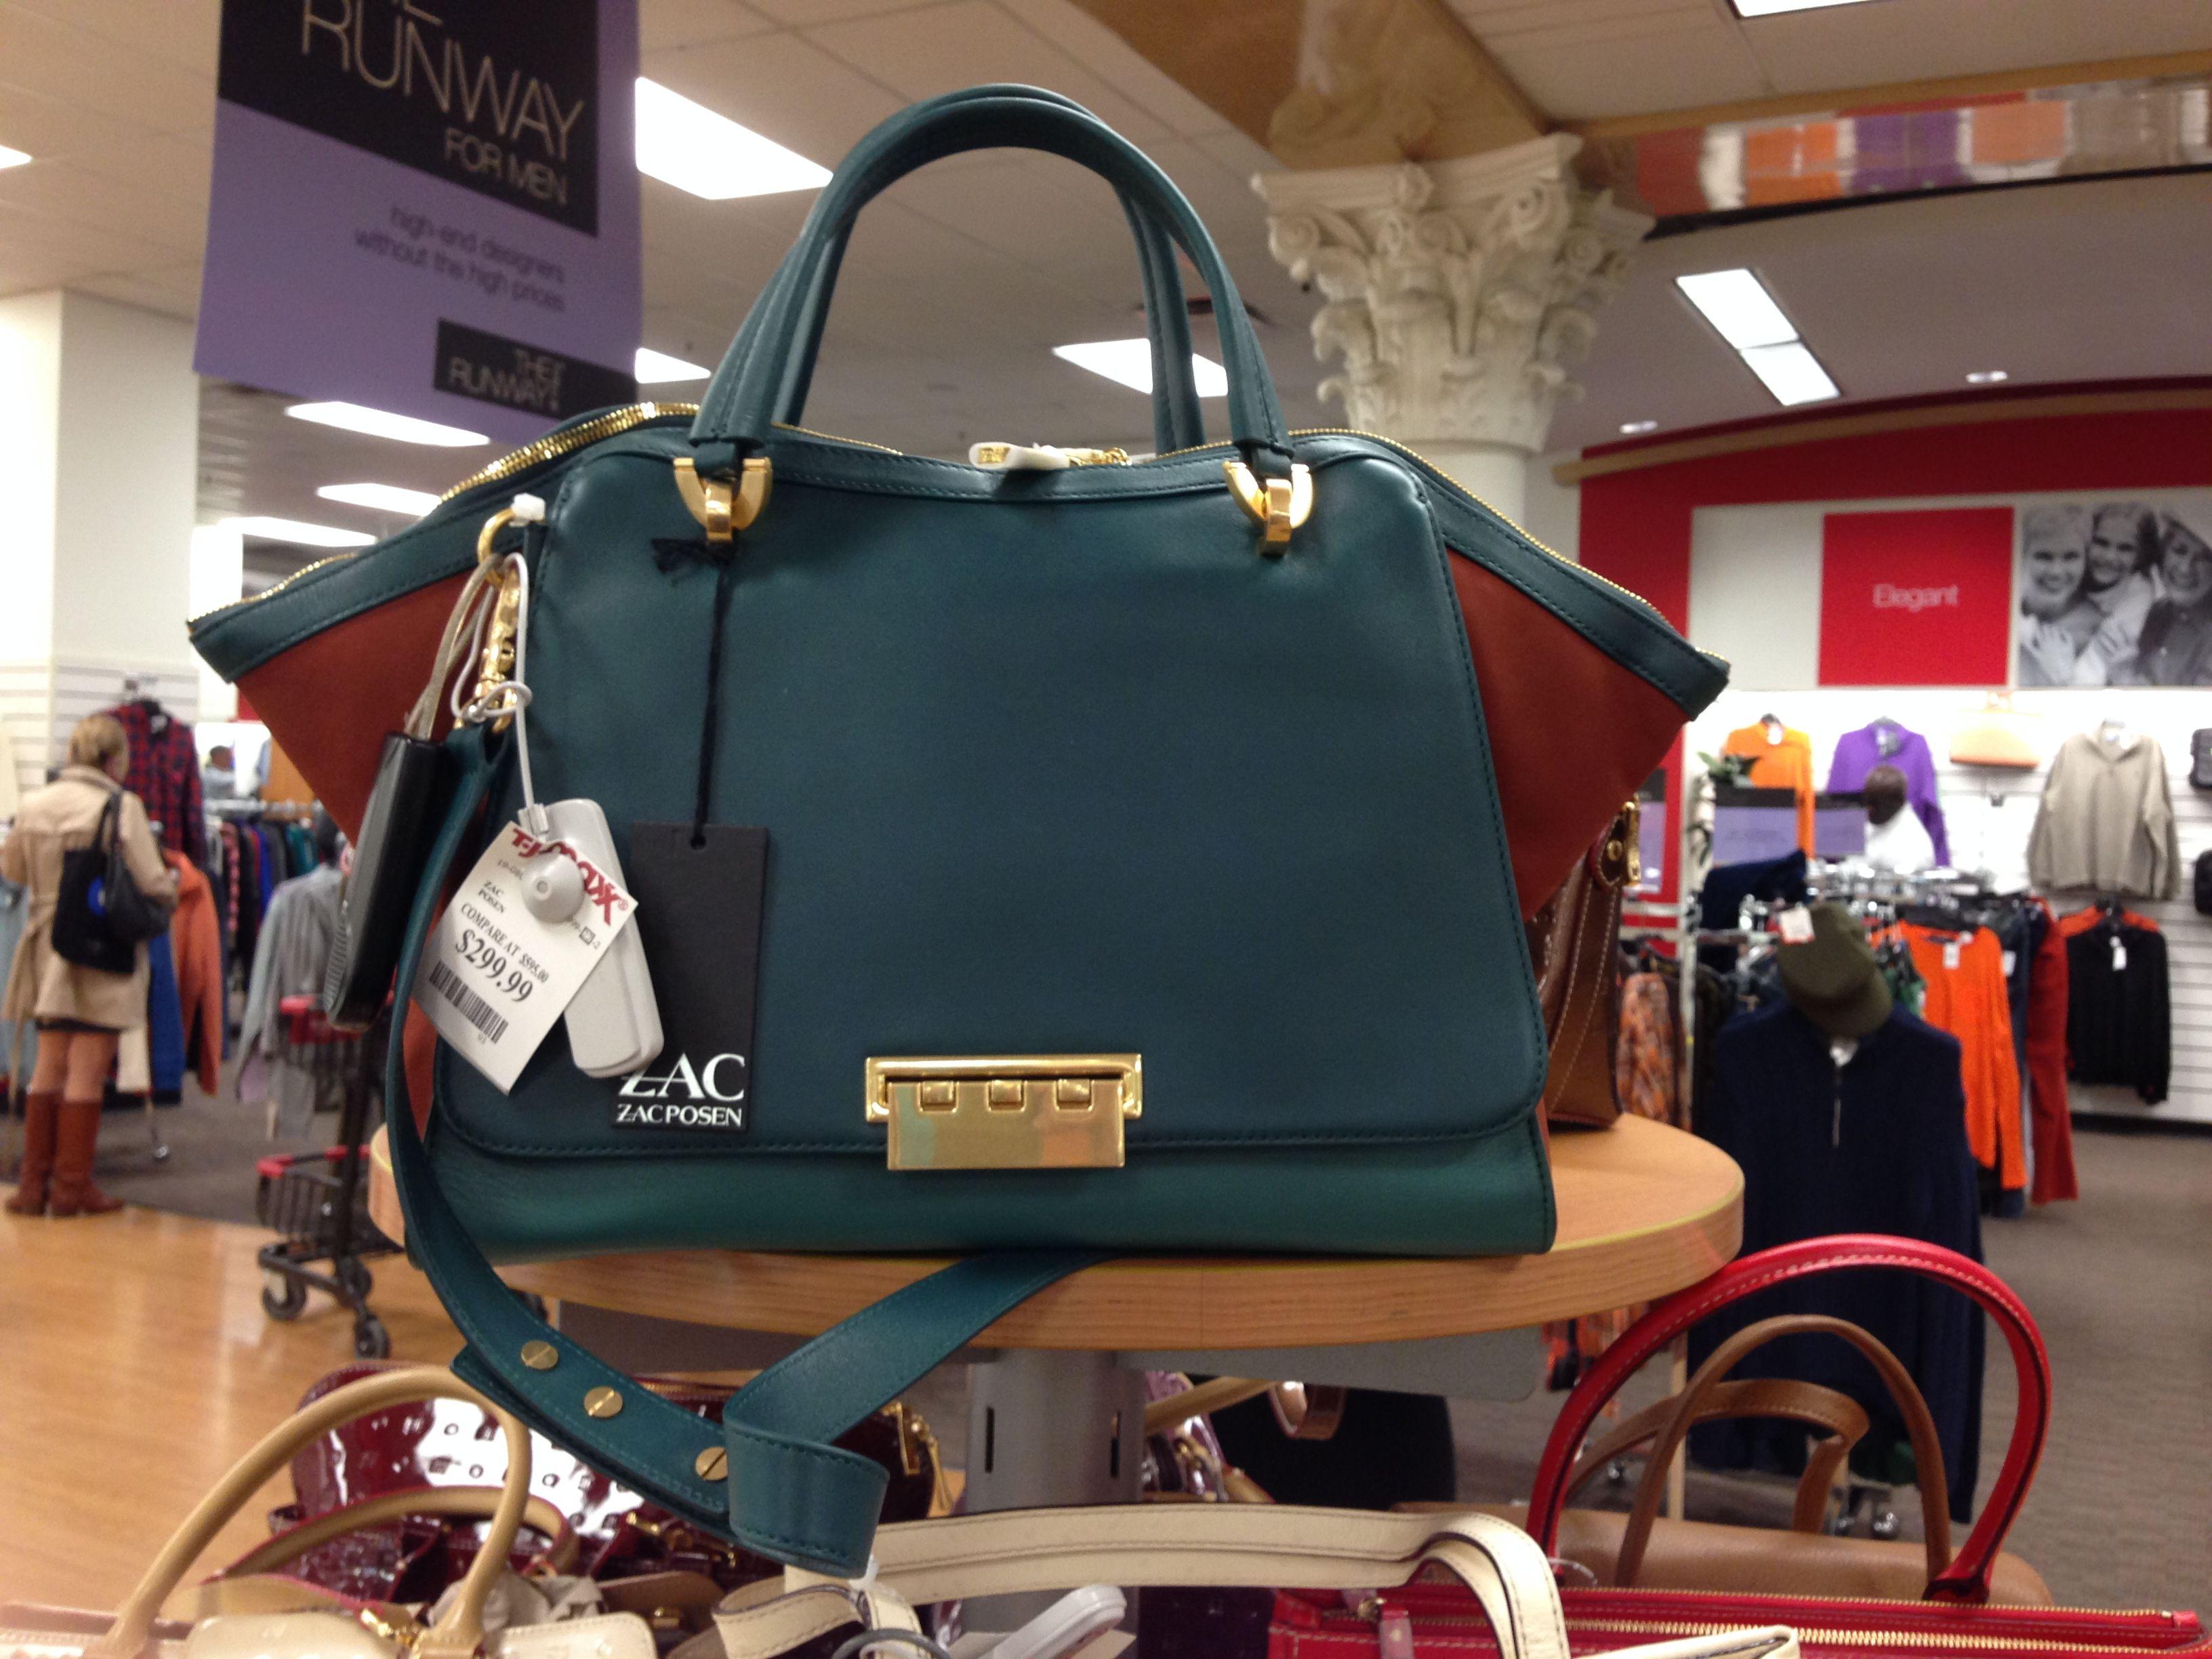 cbec34bba752 A Zac Posen bag for a steal in Manhattan... TJMaxx, 6th Ave ...